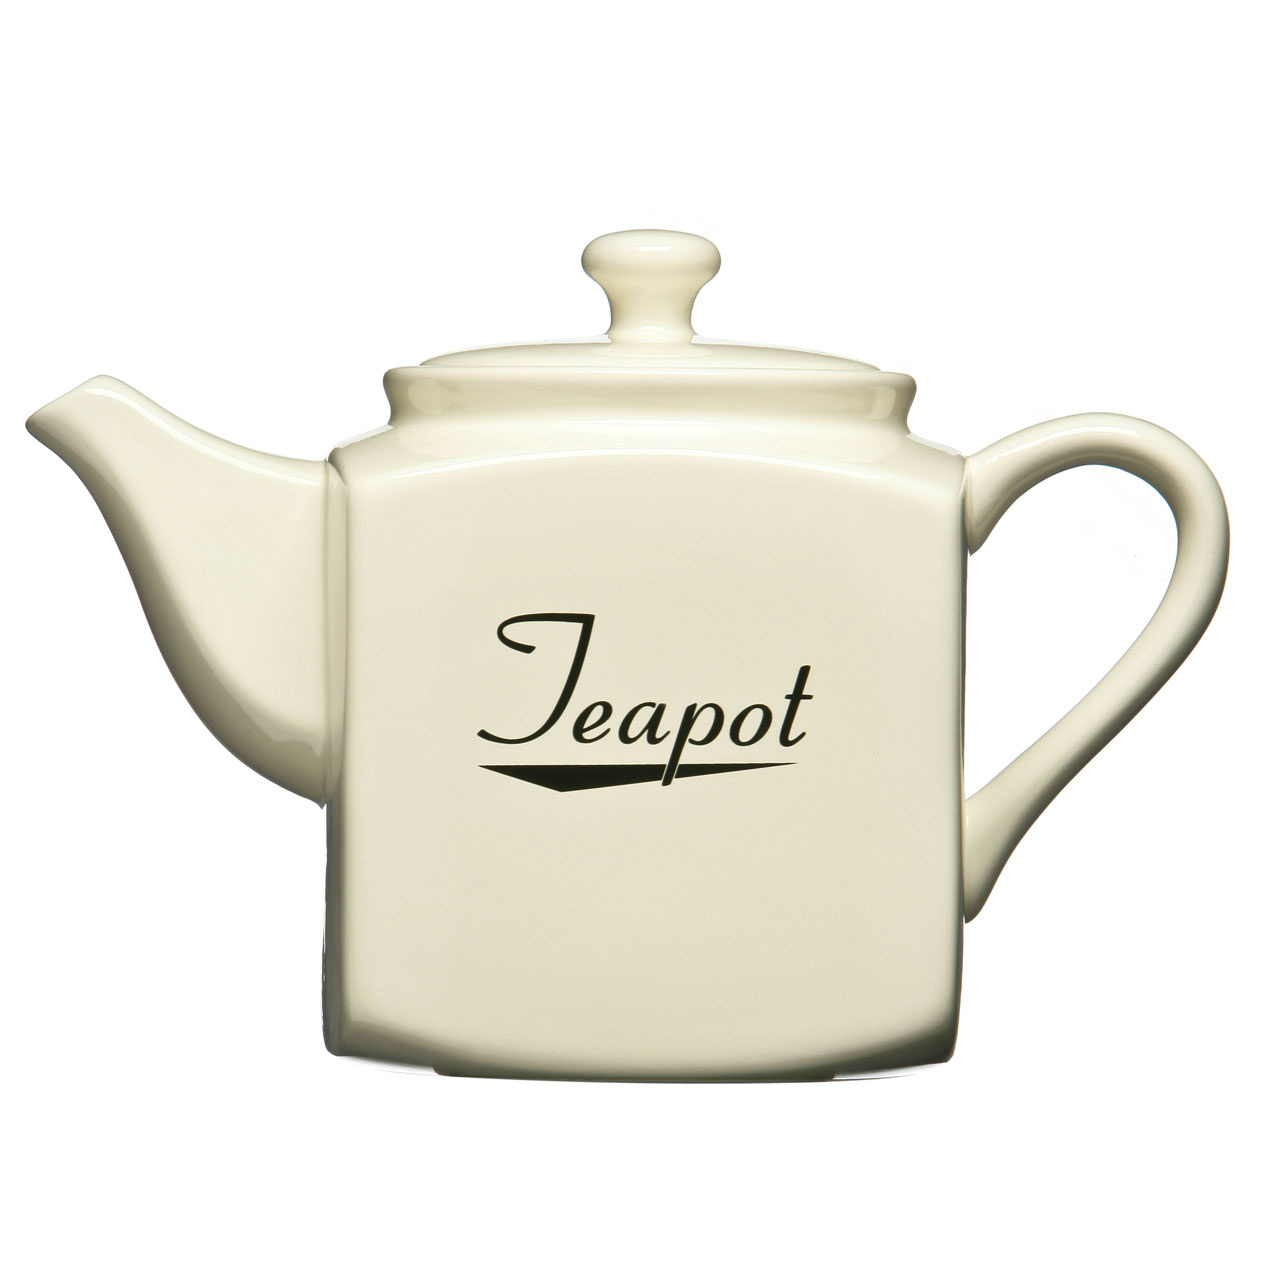 cream coronet kitchen ceramic storage canisters jars set tea